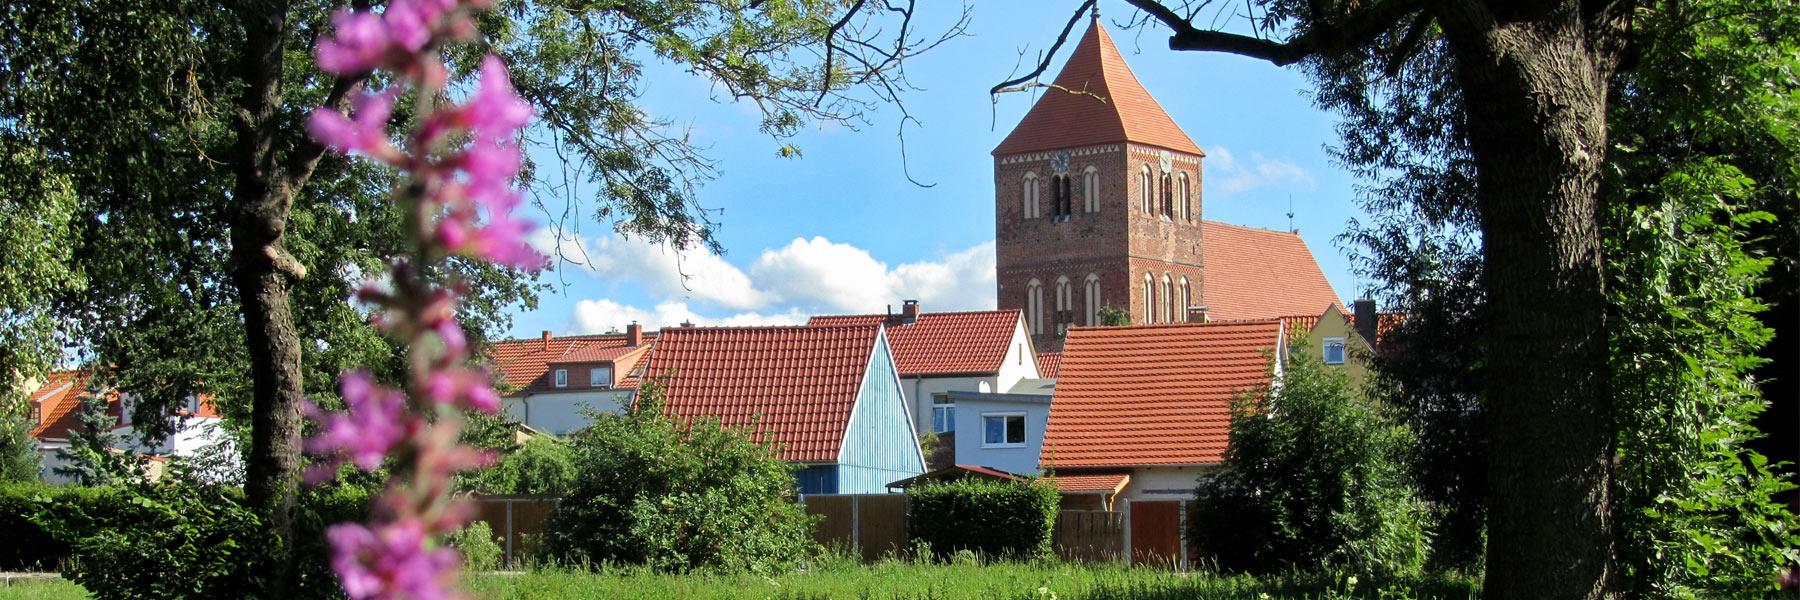 Stadtkirche - Stadt Teterow